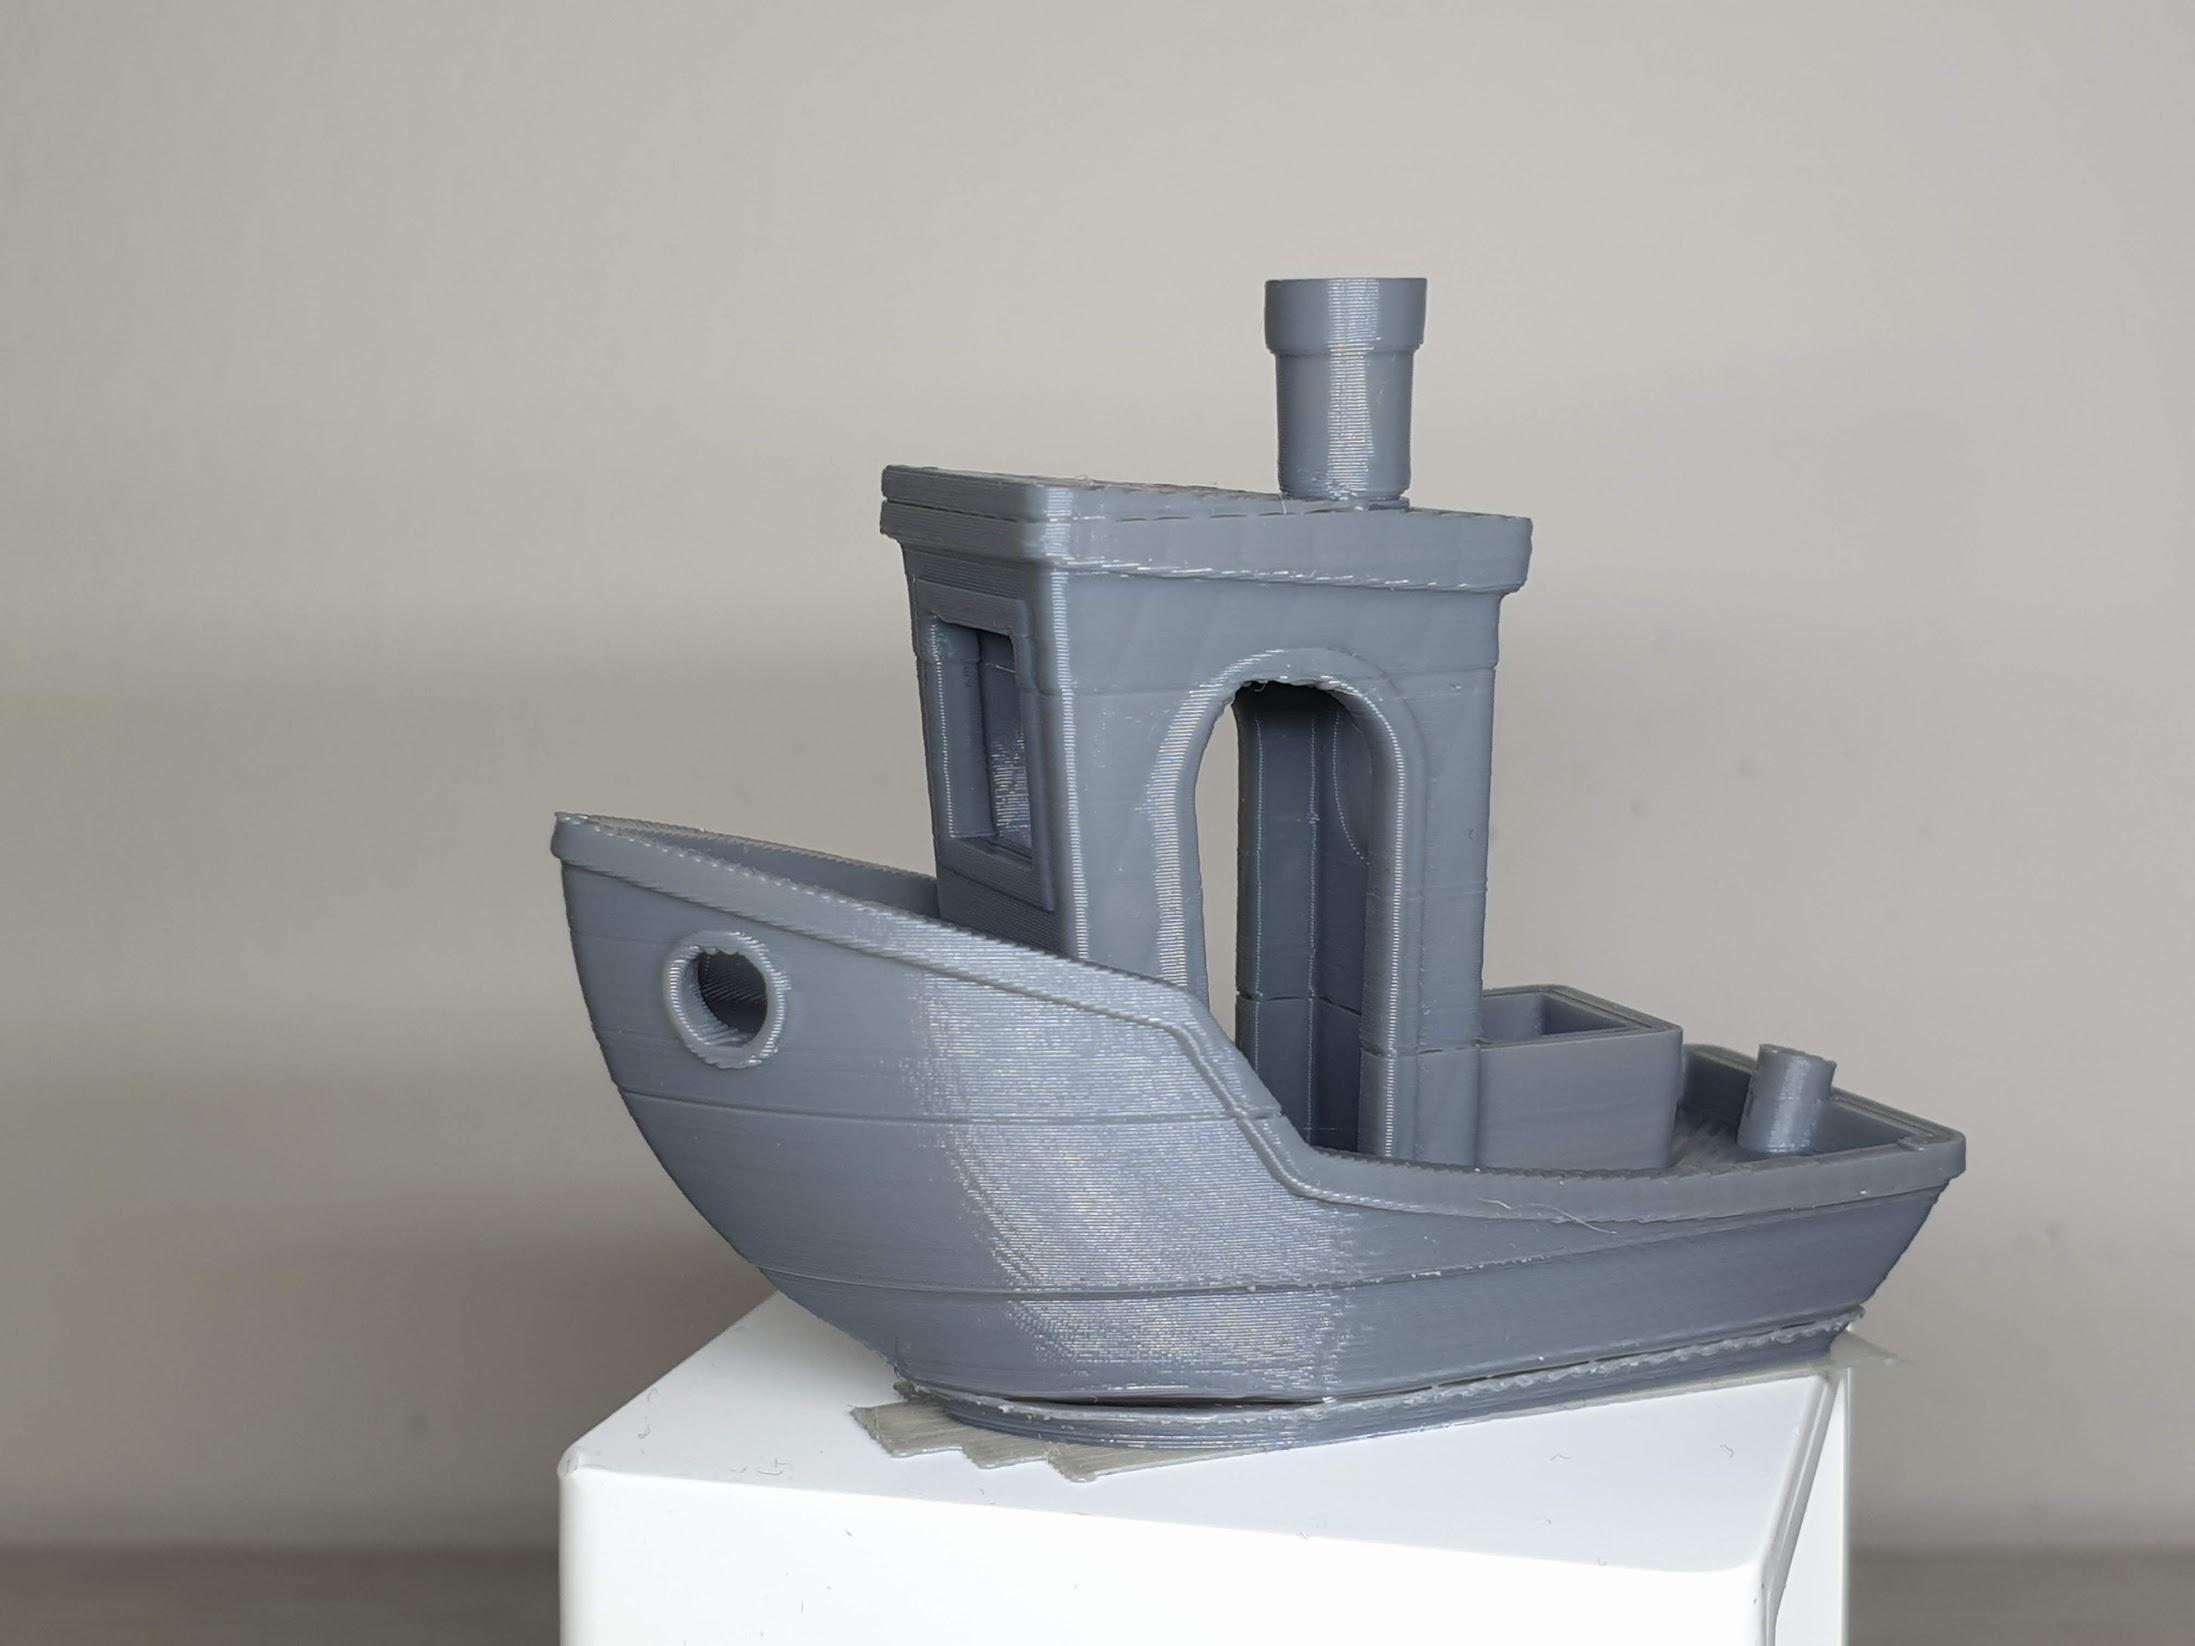 3D Benchy 3 1 | Cube2 Mini Review - 3D Printer for Kids